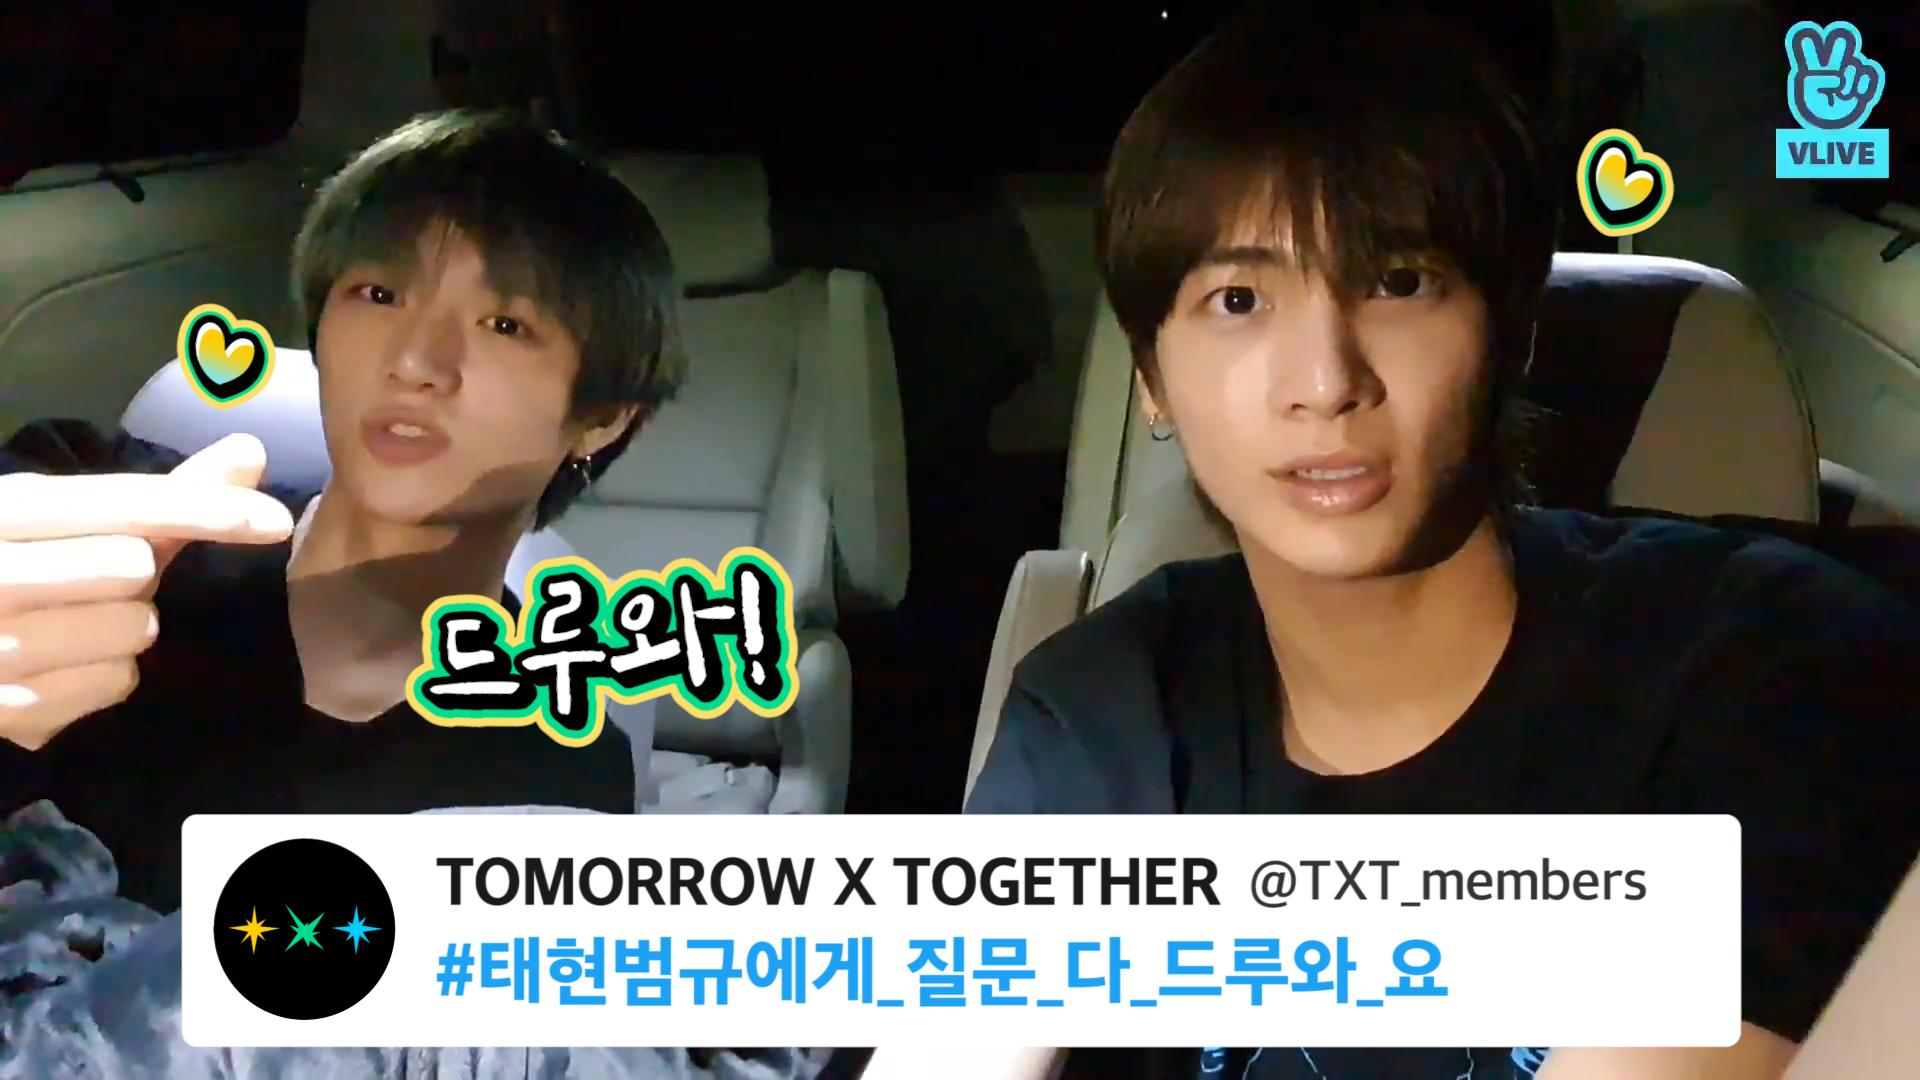 [TXT] 우뿌즈 오조오억년전부터 내 심장 뿌수러 드루와있었다네요❤️👊 (BEOMGYU&TAEHYUN talking about fans' questions)